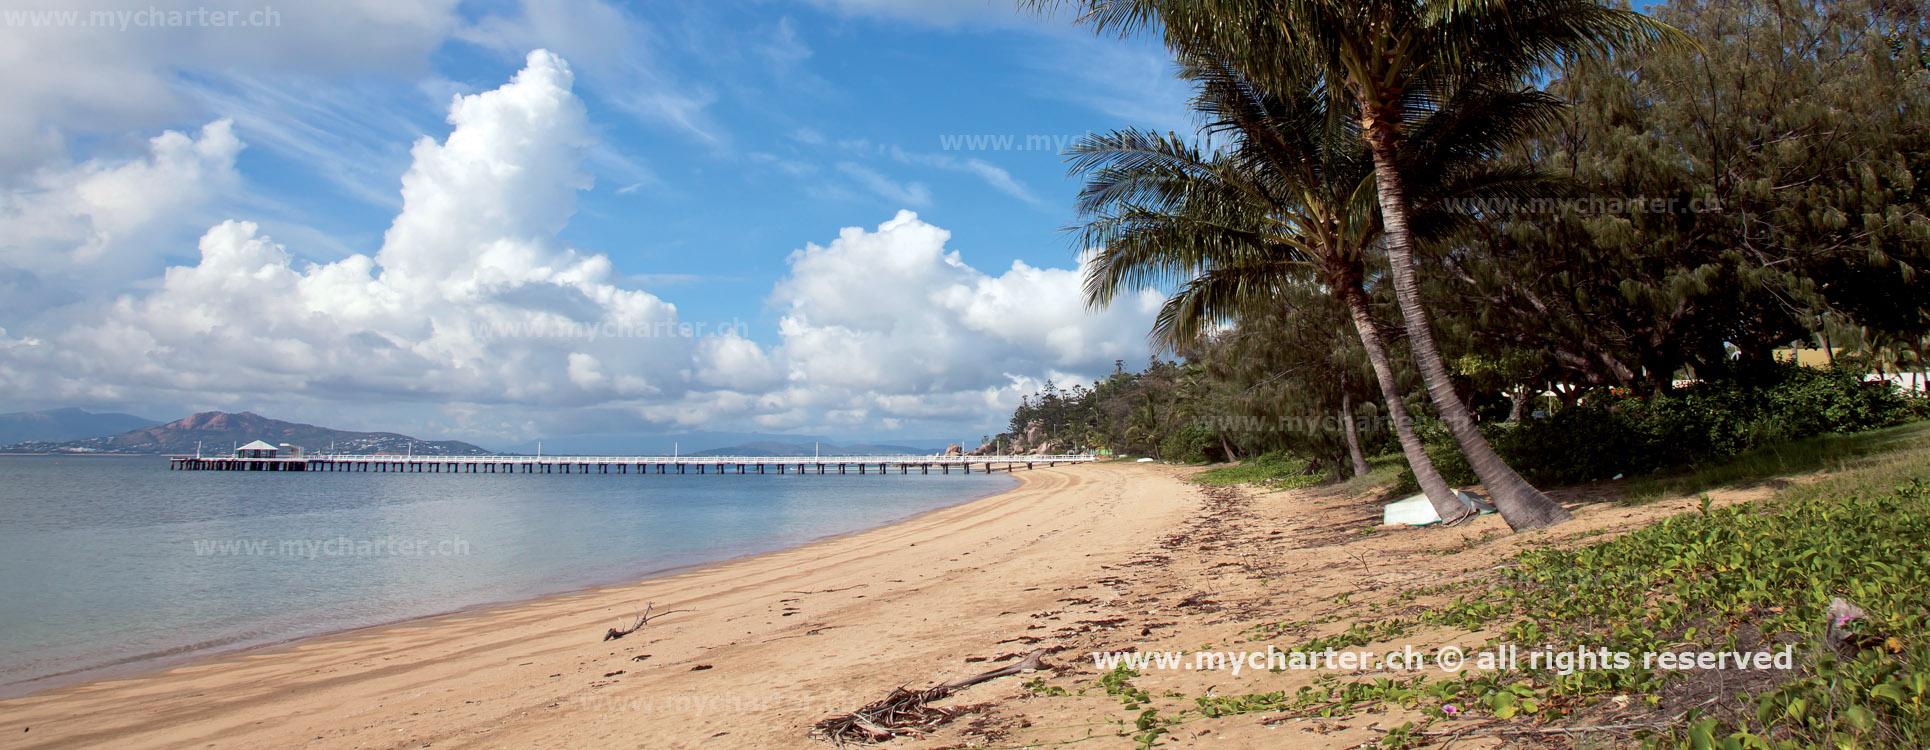 Yachtcharter Australien - Nelly Beach